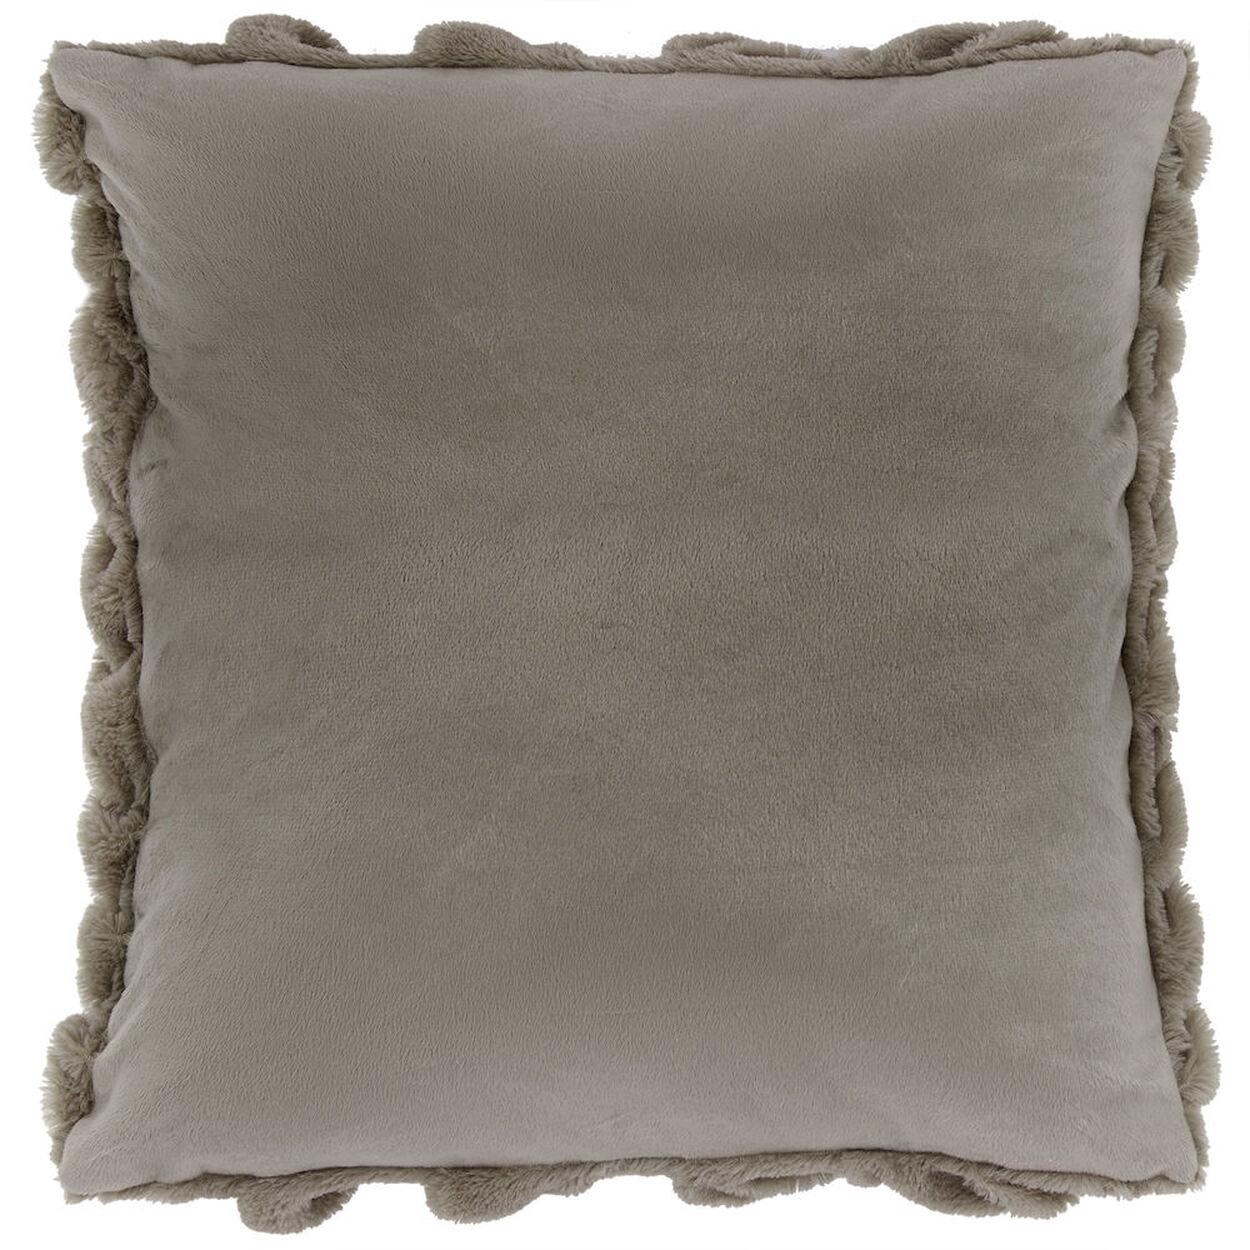 "Foxy Faux Fur Decorative Pillow 18"" X 18"""